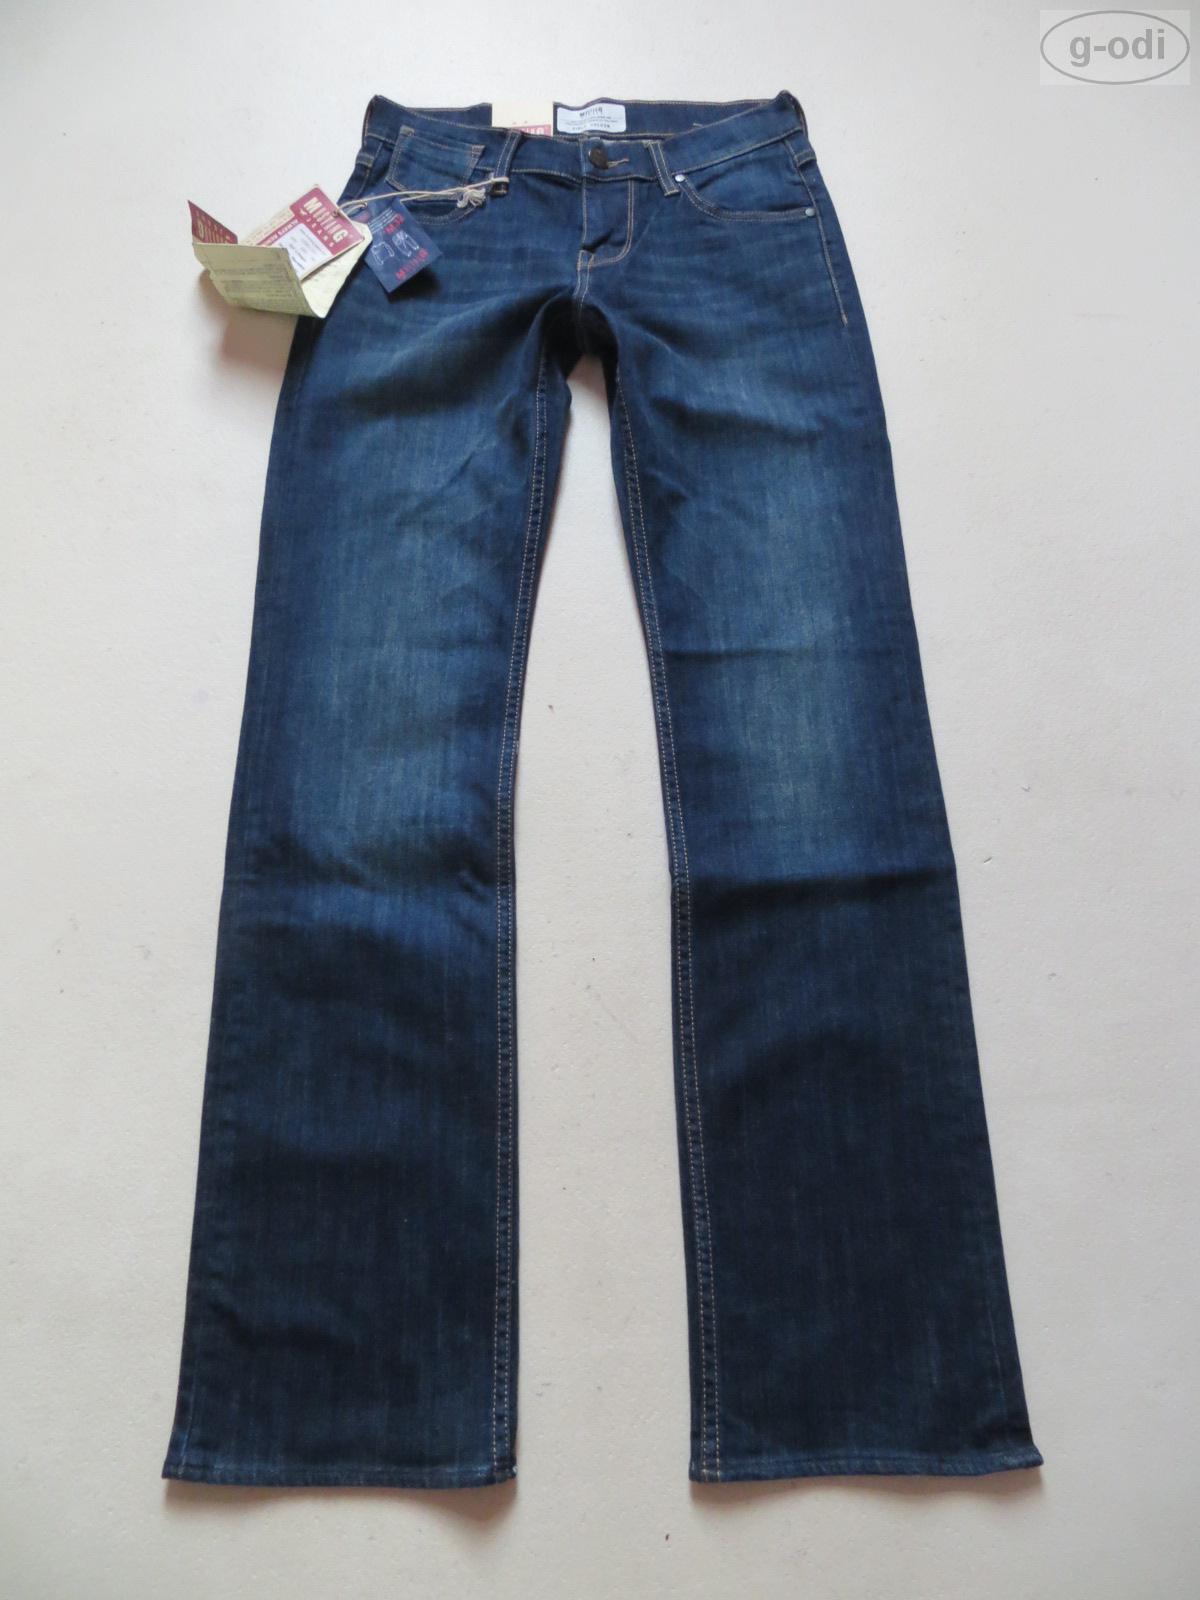 Mustang OREGON Jeans Hose W 27  L 32 NEU   Faded wash Indigo Stretch Denim